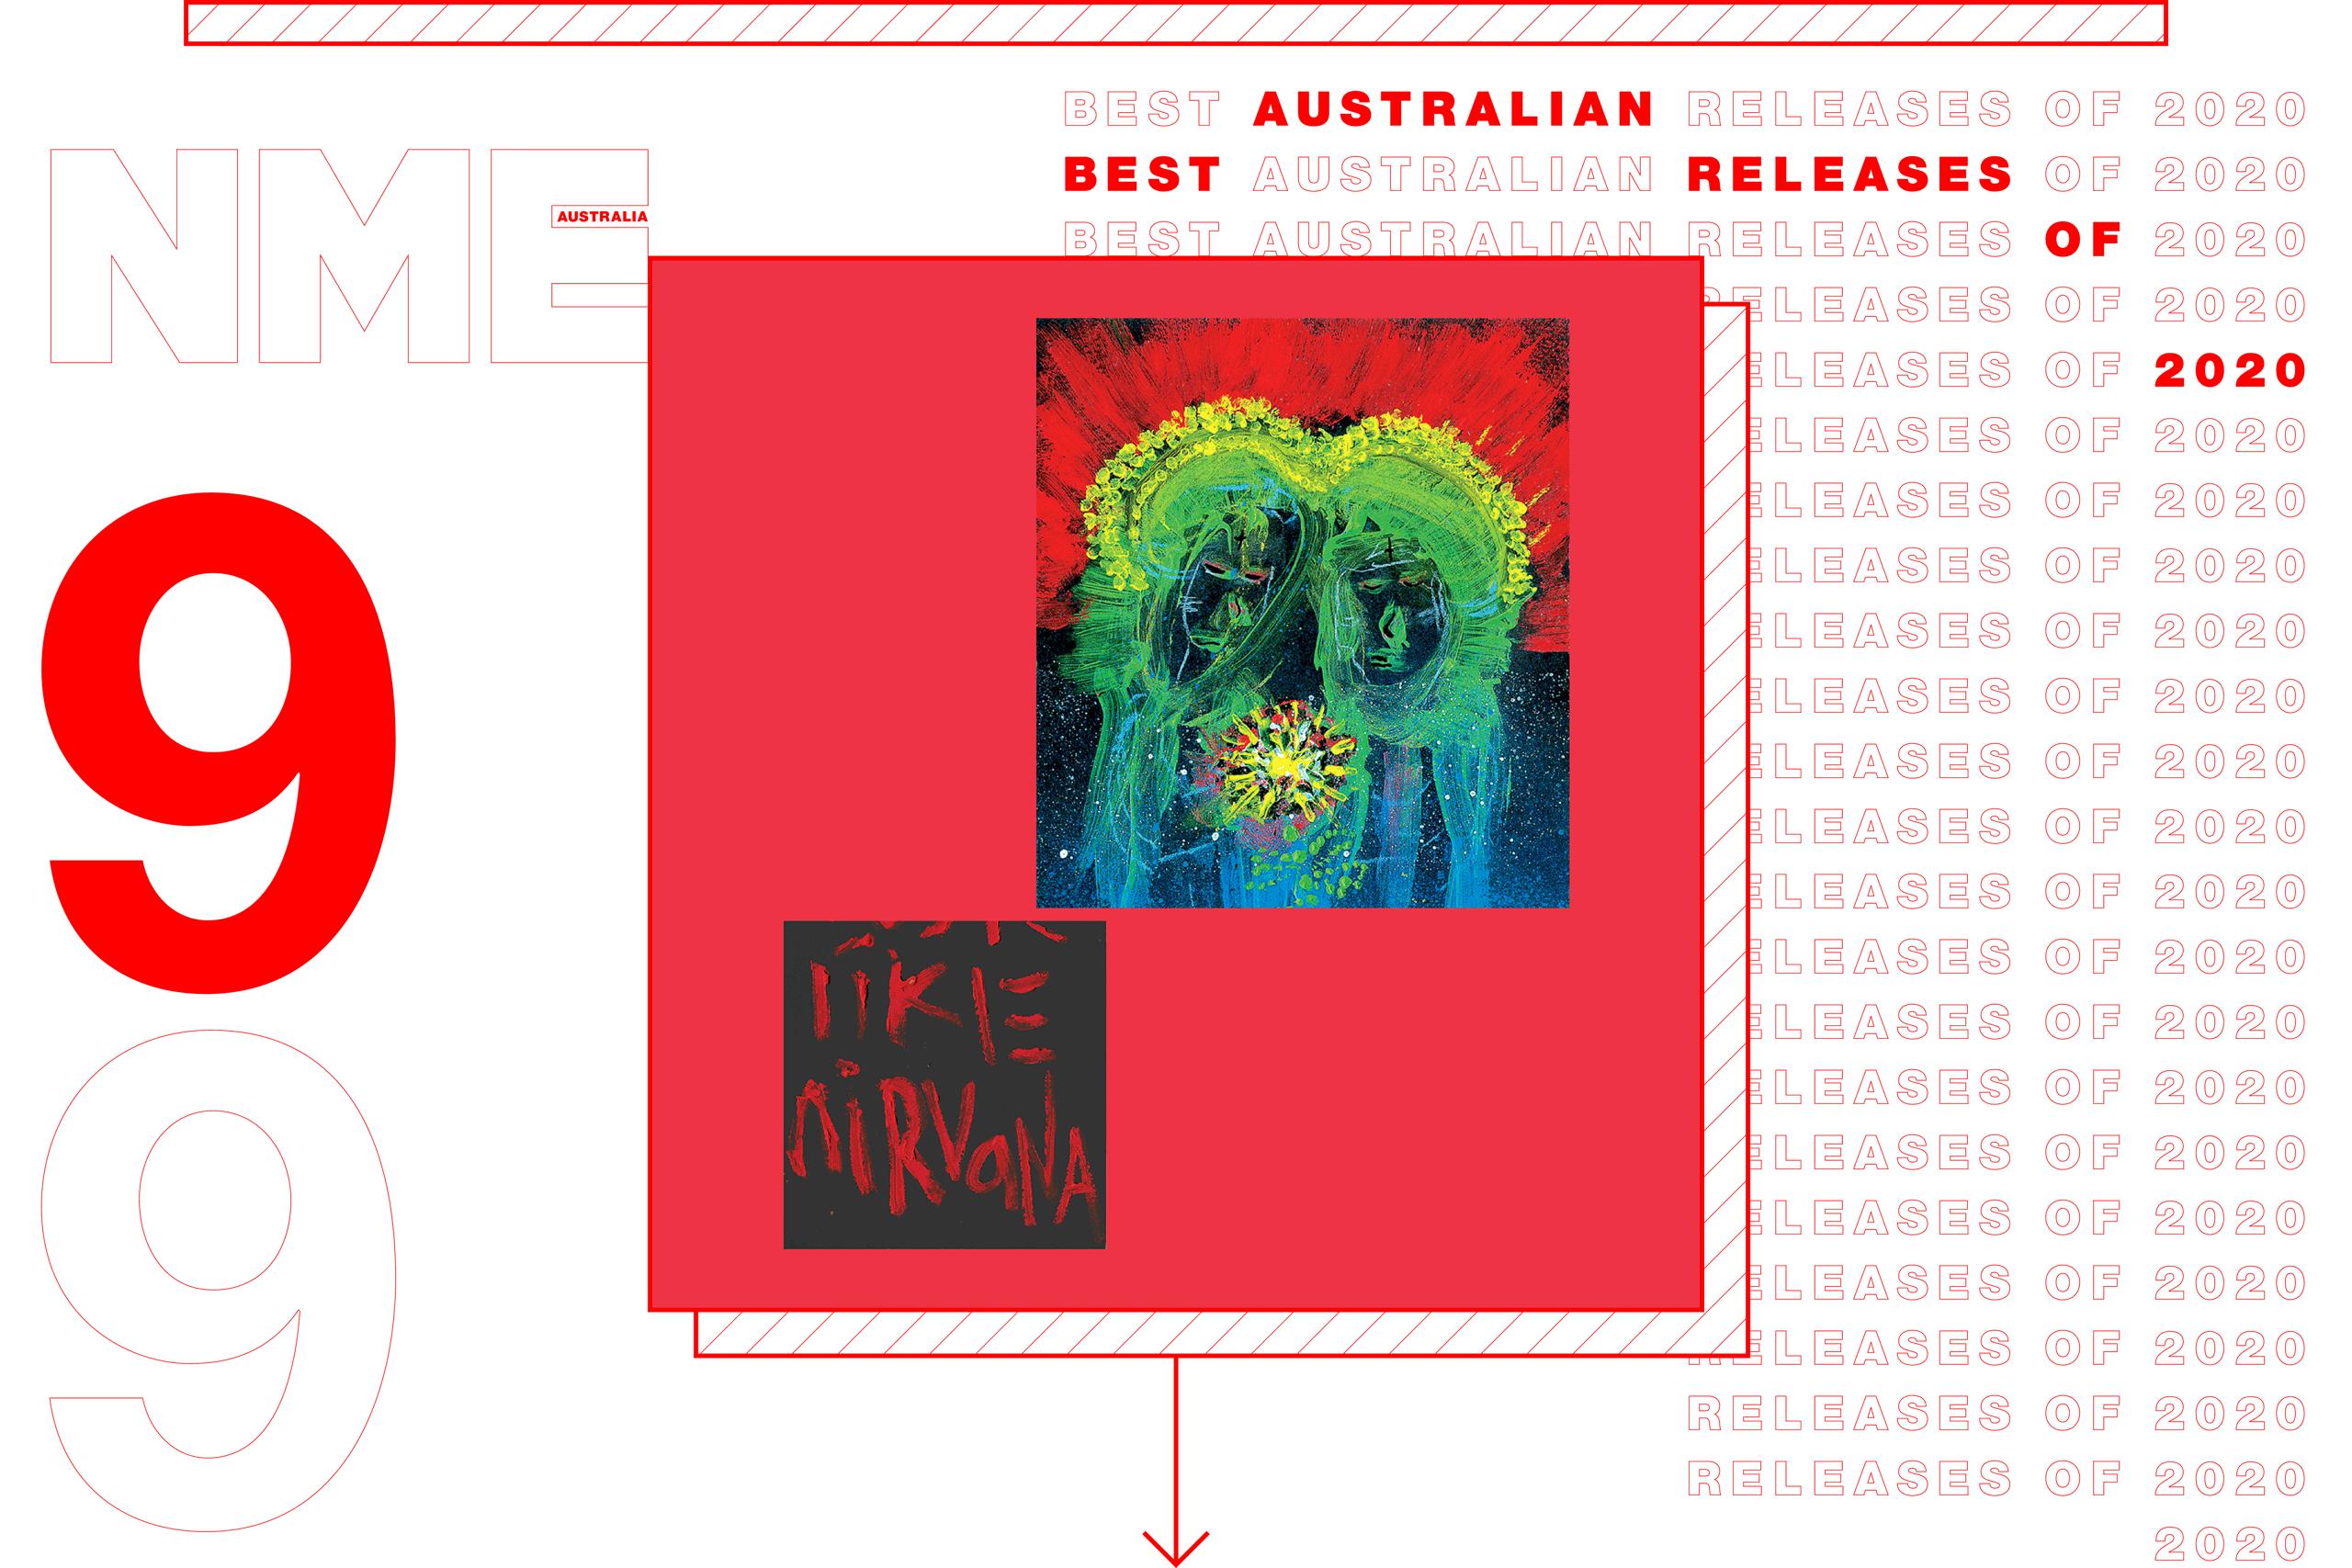 NME Australian Album Release 9